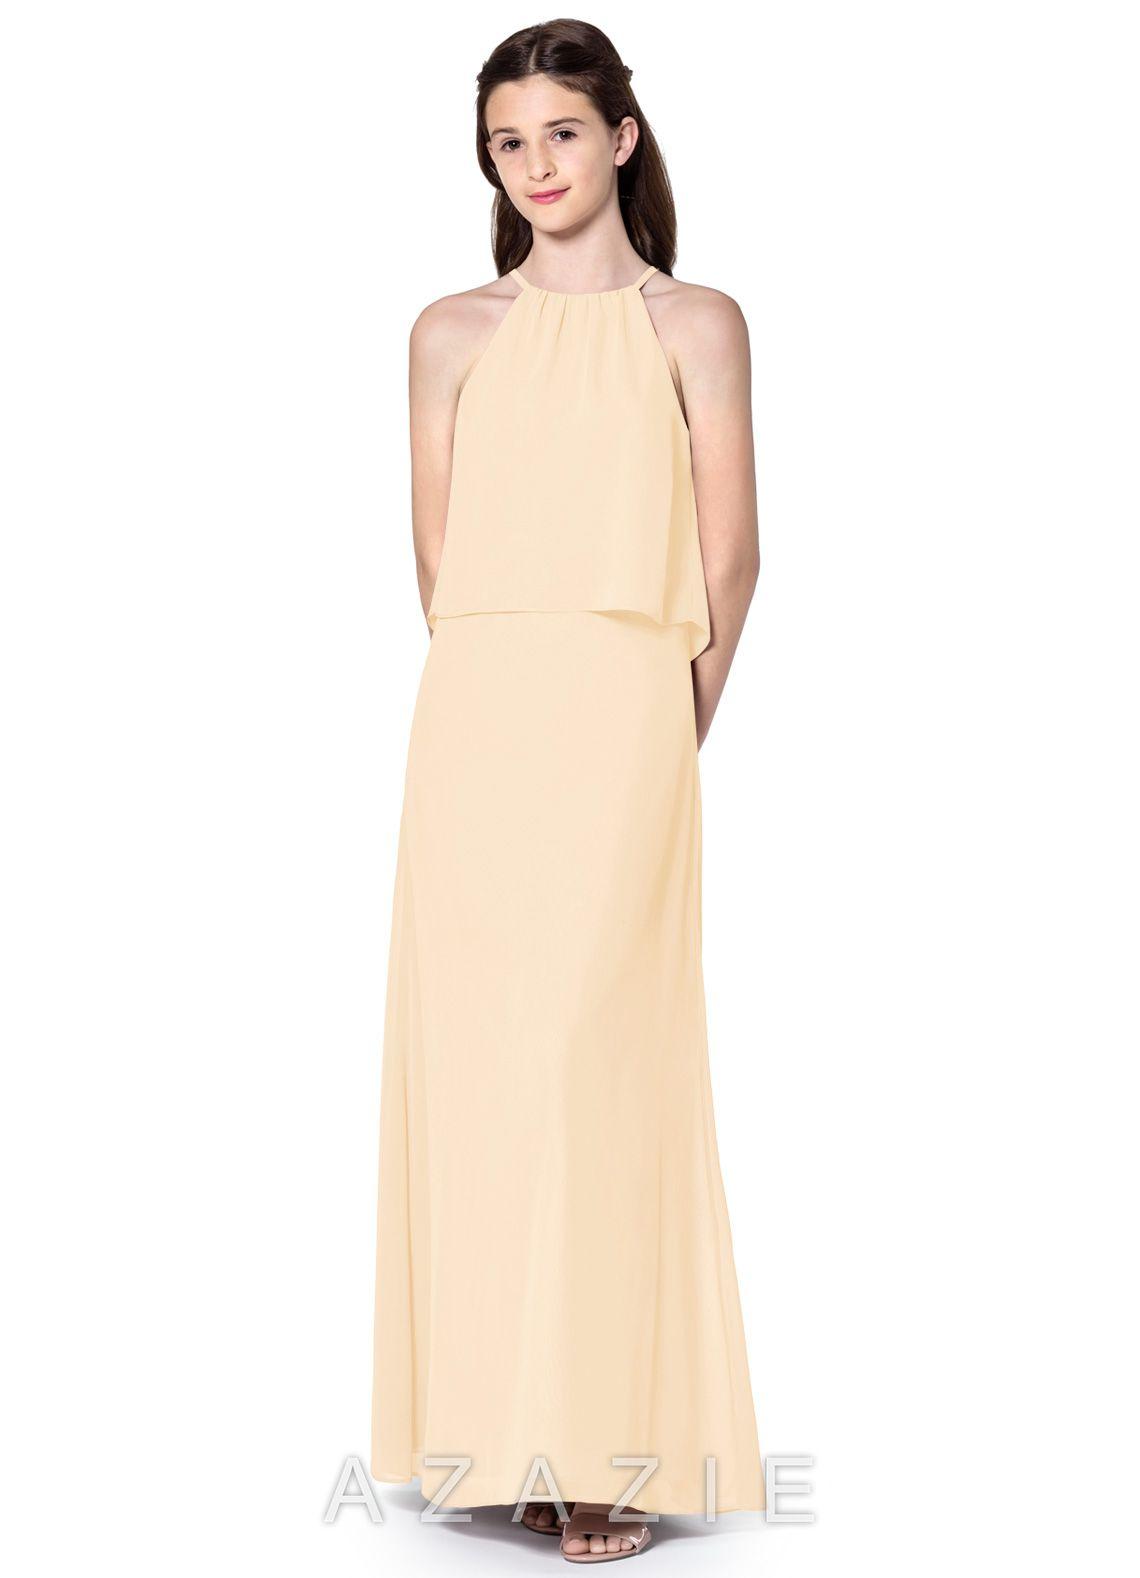 36ef4b305 Azazie Eloise JBD Junior Bridesmaid Dress | Azazie